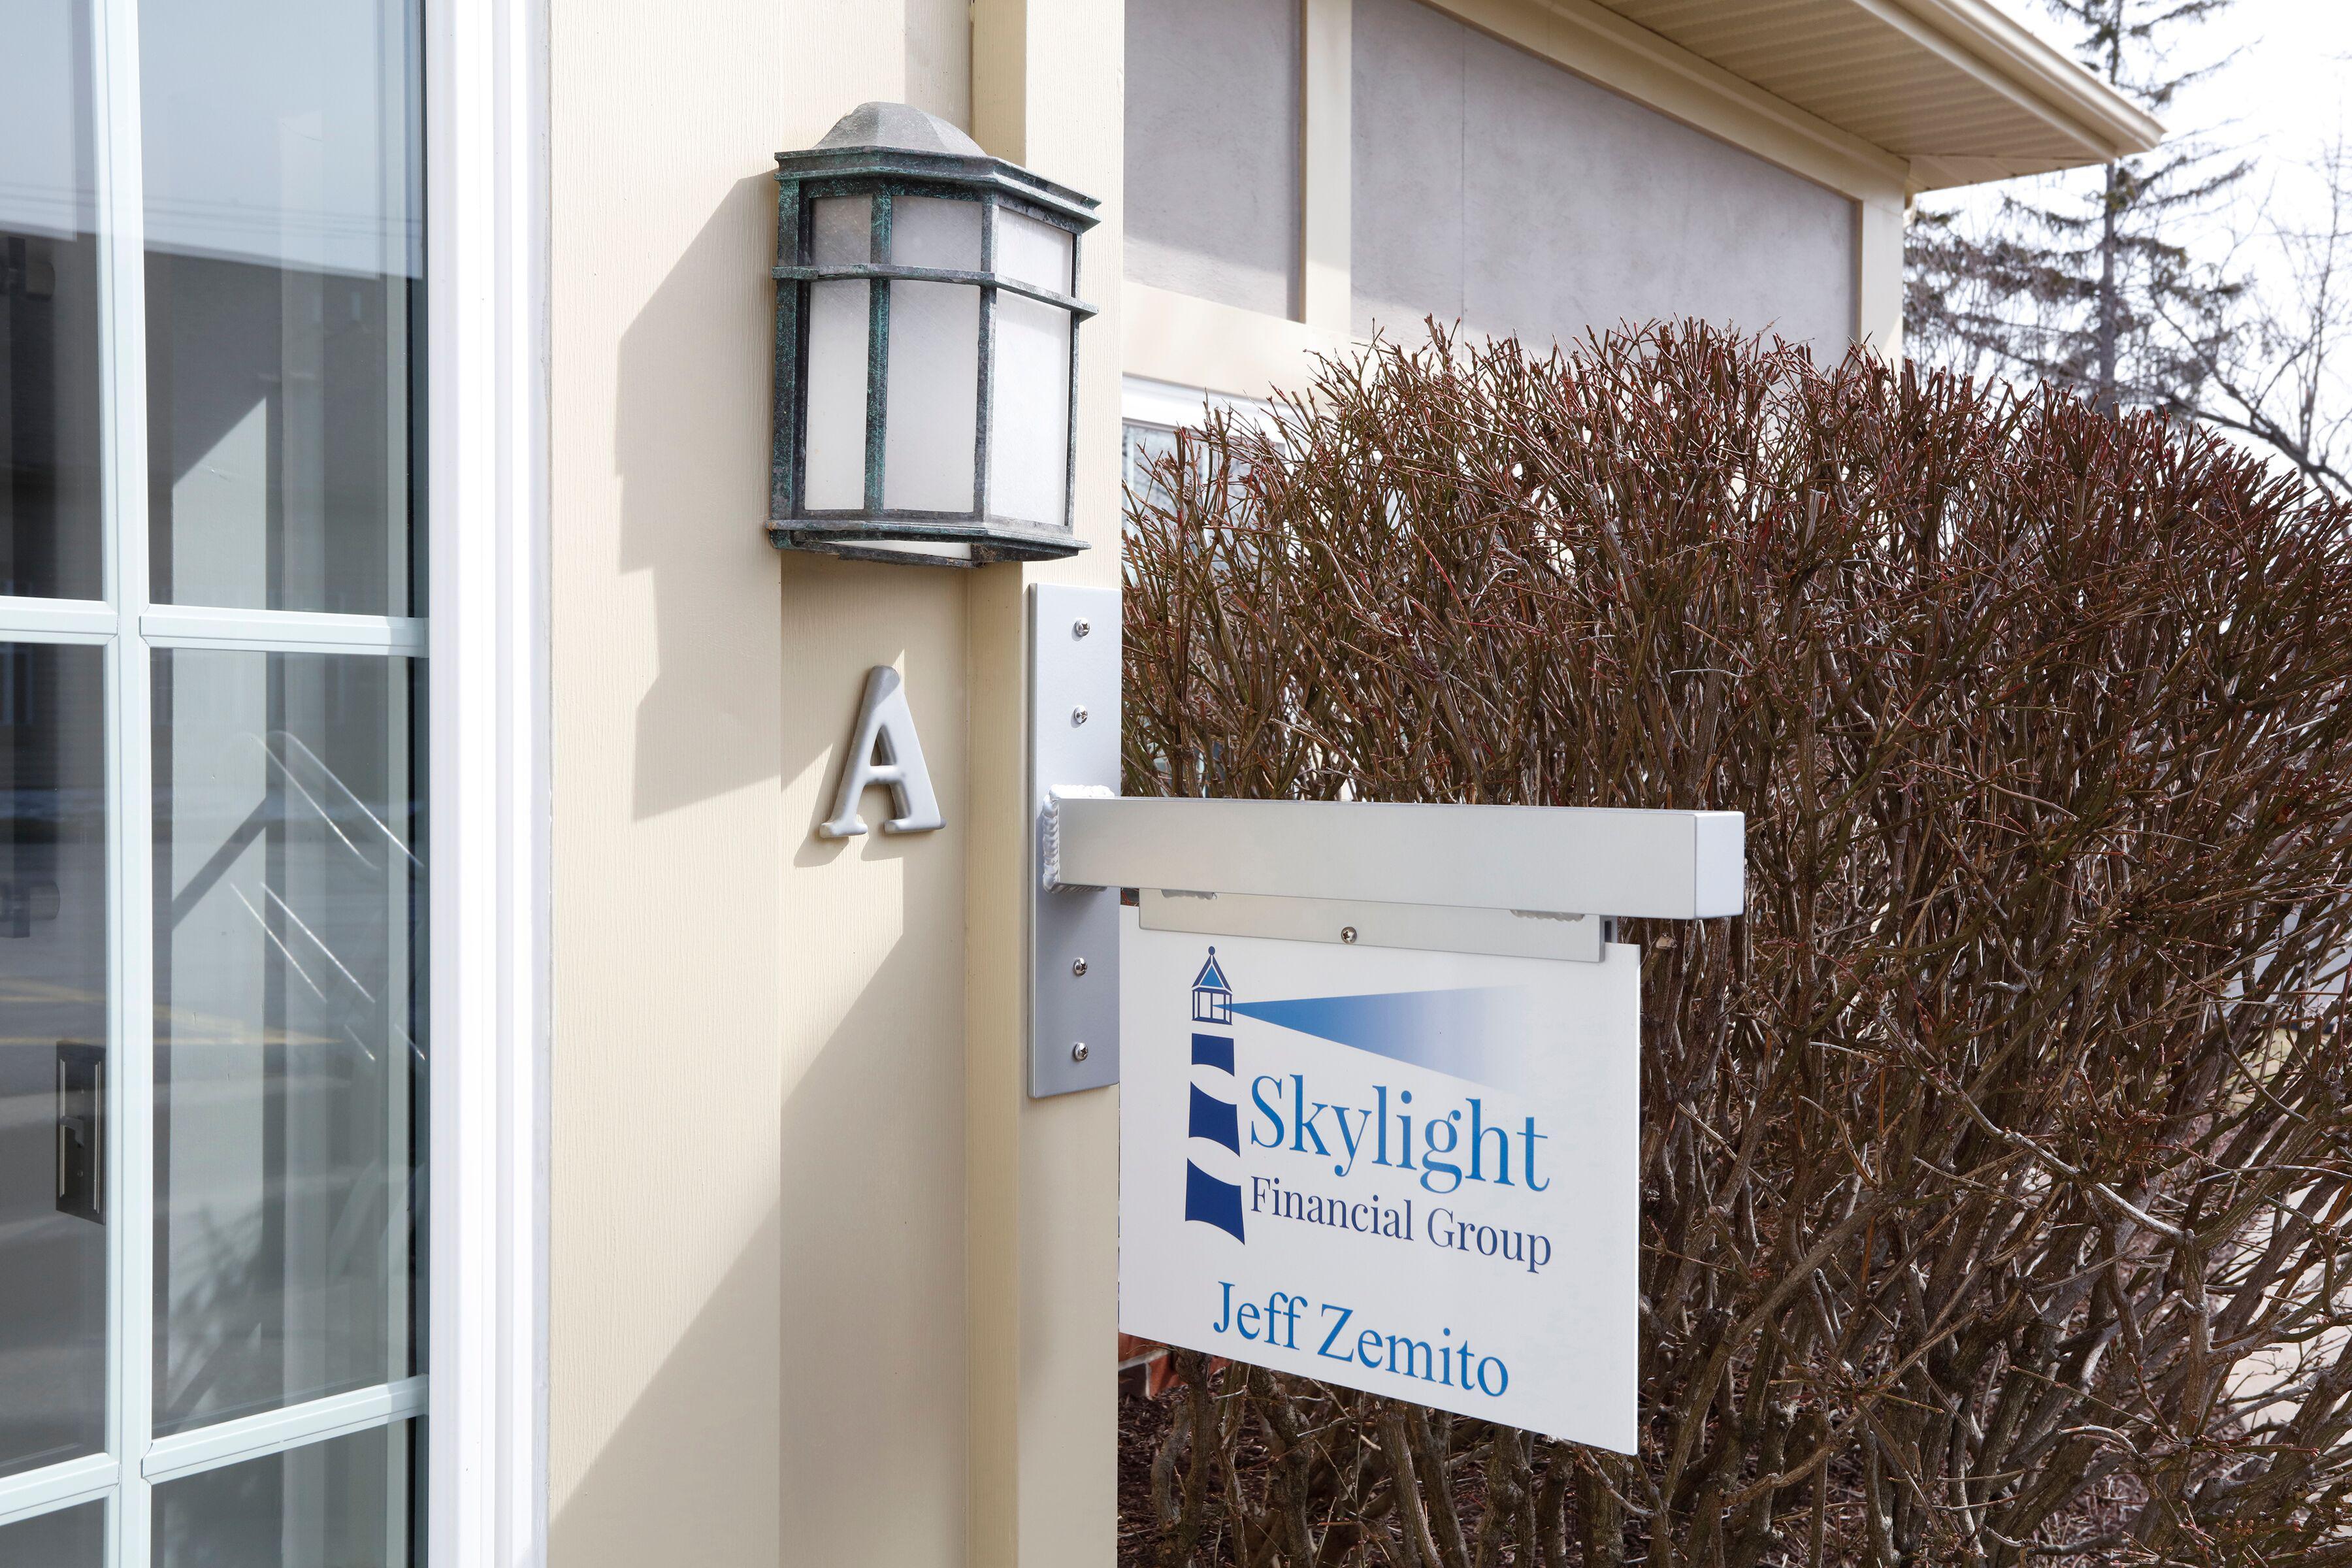 Jeff Zemito - Skylight Financial Group